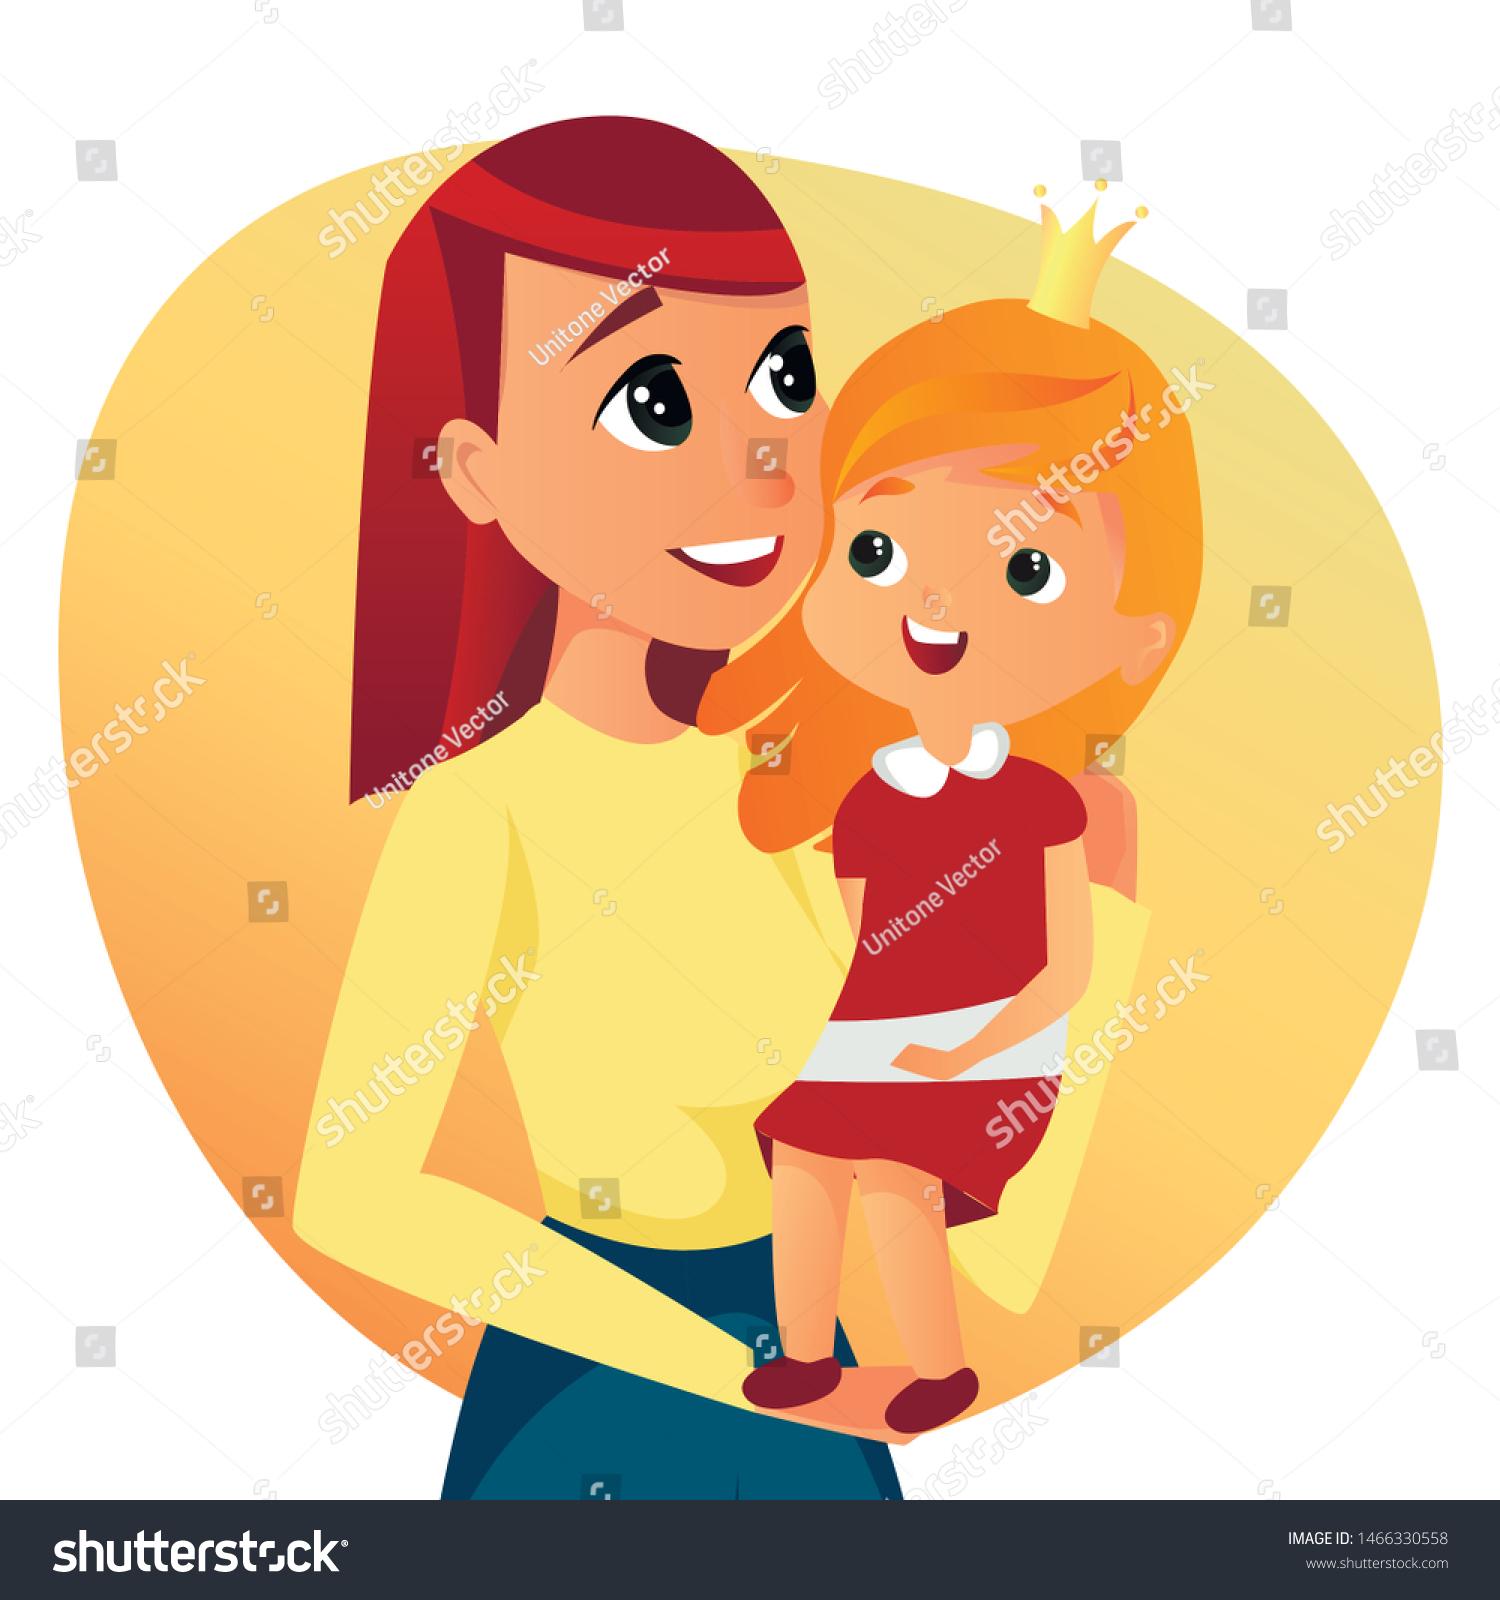 Portrait Cartoon Woman Hold Girl Vector Stock Vector Royalty Free 1466330558